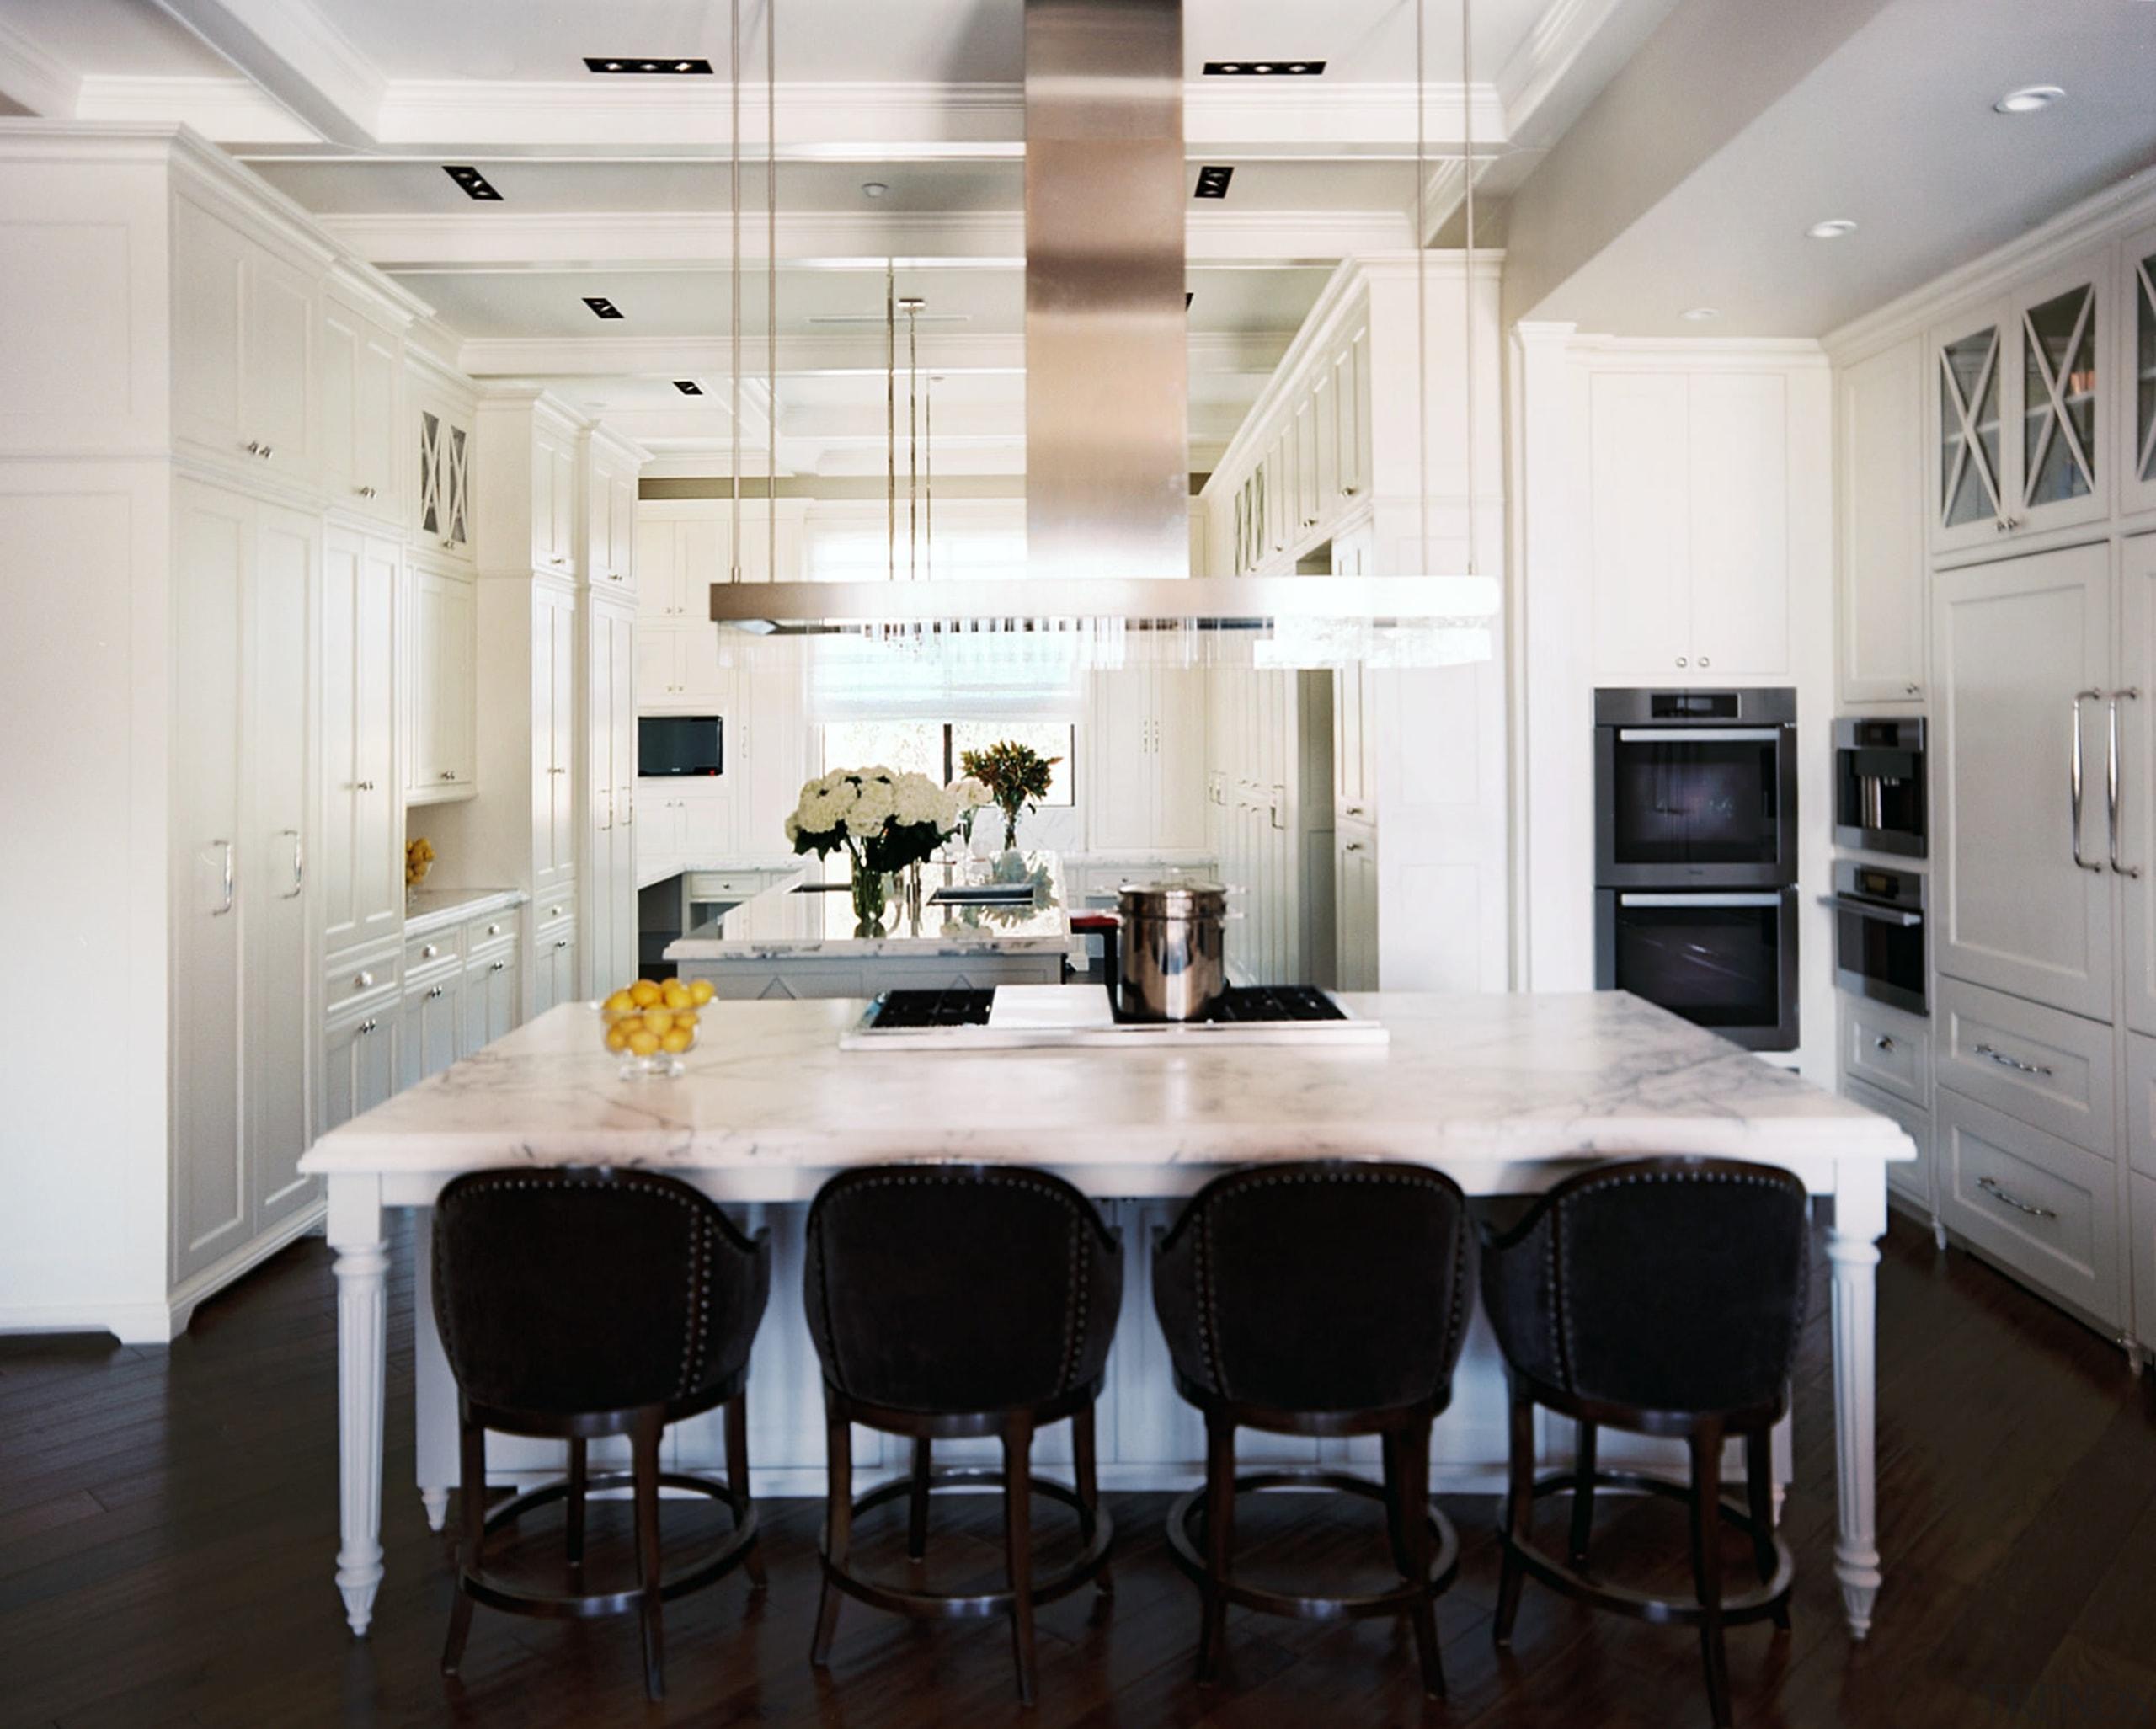 Black bar stools and a dark walnut floor cabinetry, countertop, cuisine classique, dining room, floor, flooring, interior design, kitchen, room, wood flooring, white, black